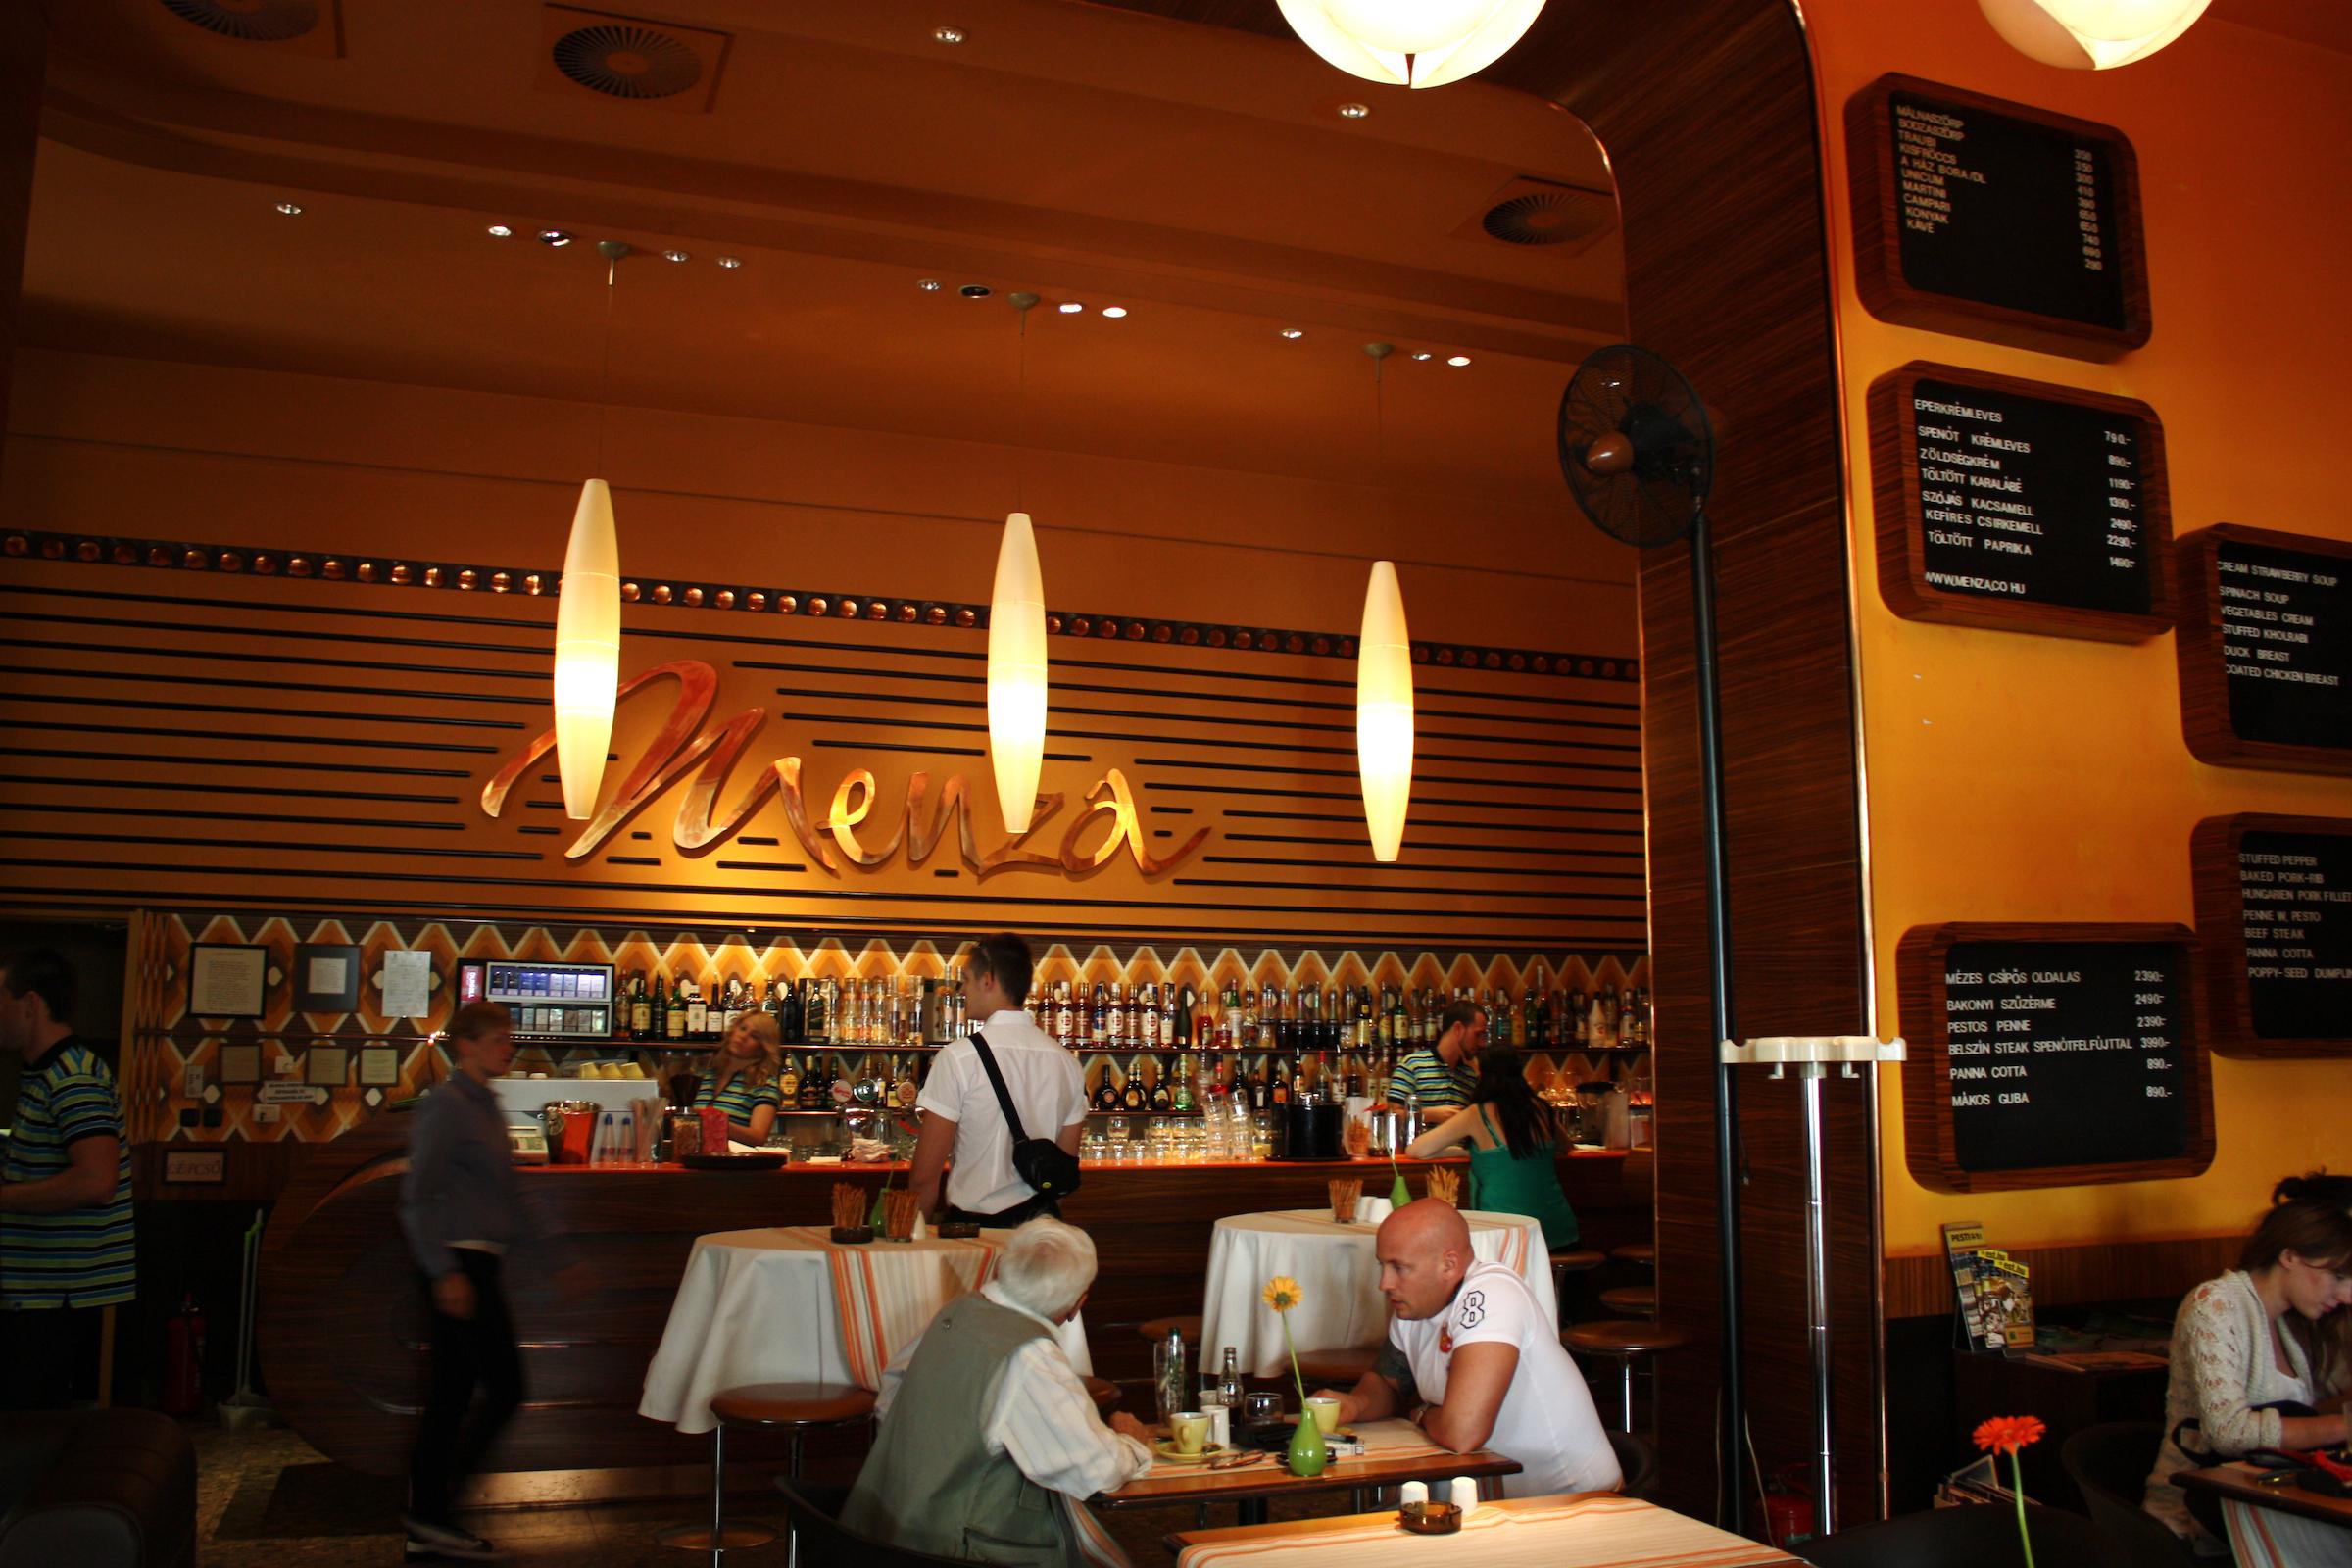 Restaurant Organizational Chart: Menza Restaurant Budapest 04.jpg - Wikimedia Commons,Chart